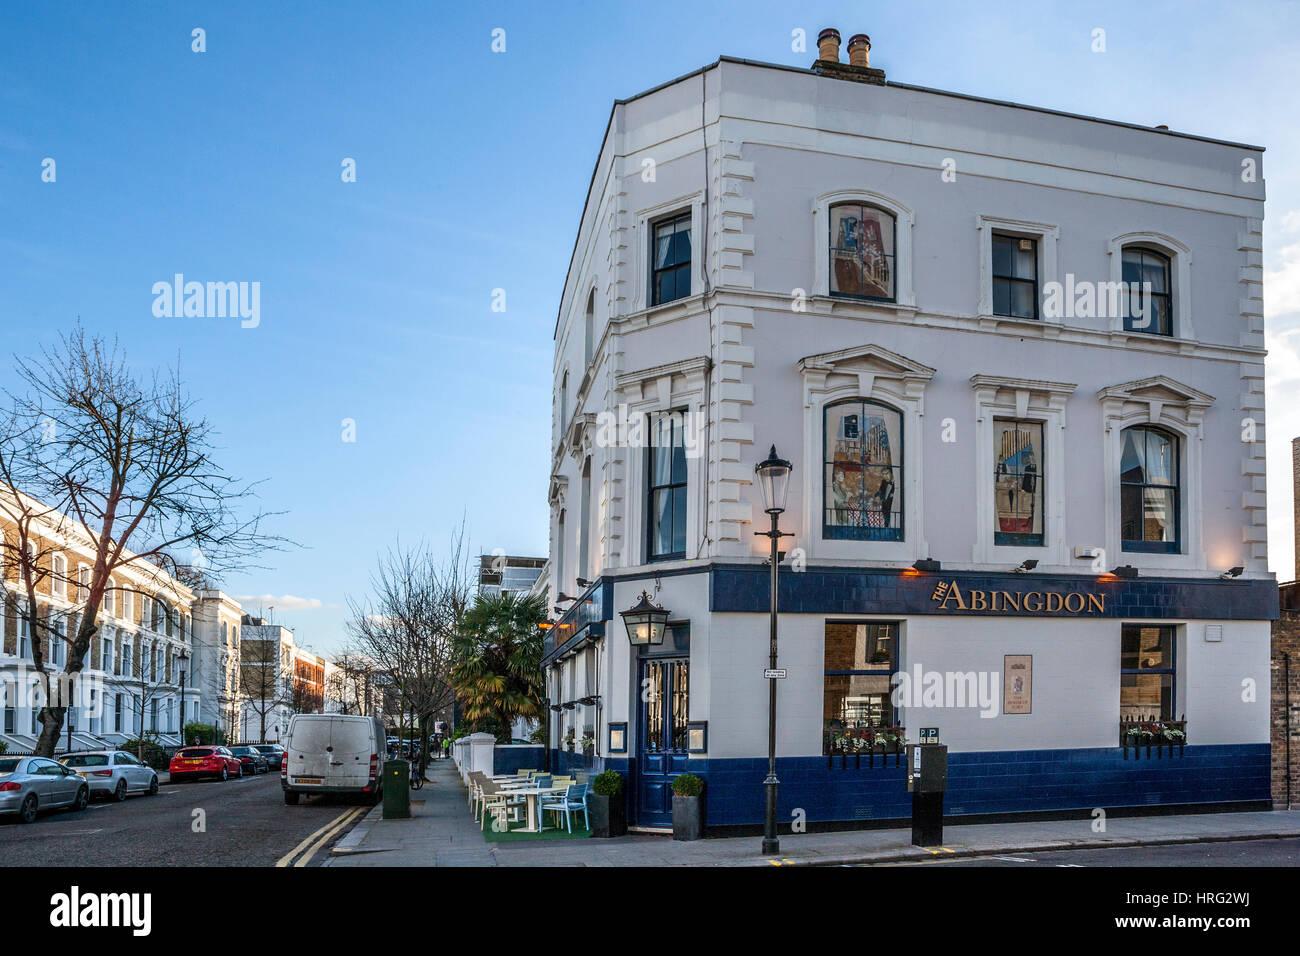 The Abingdon, Kensington, London - Stock Image